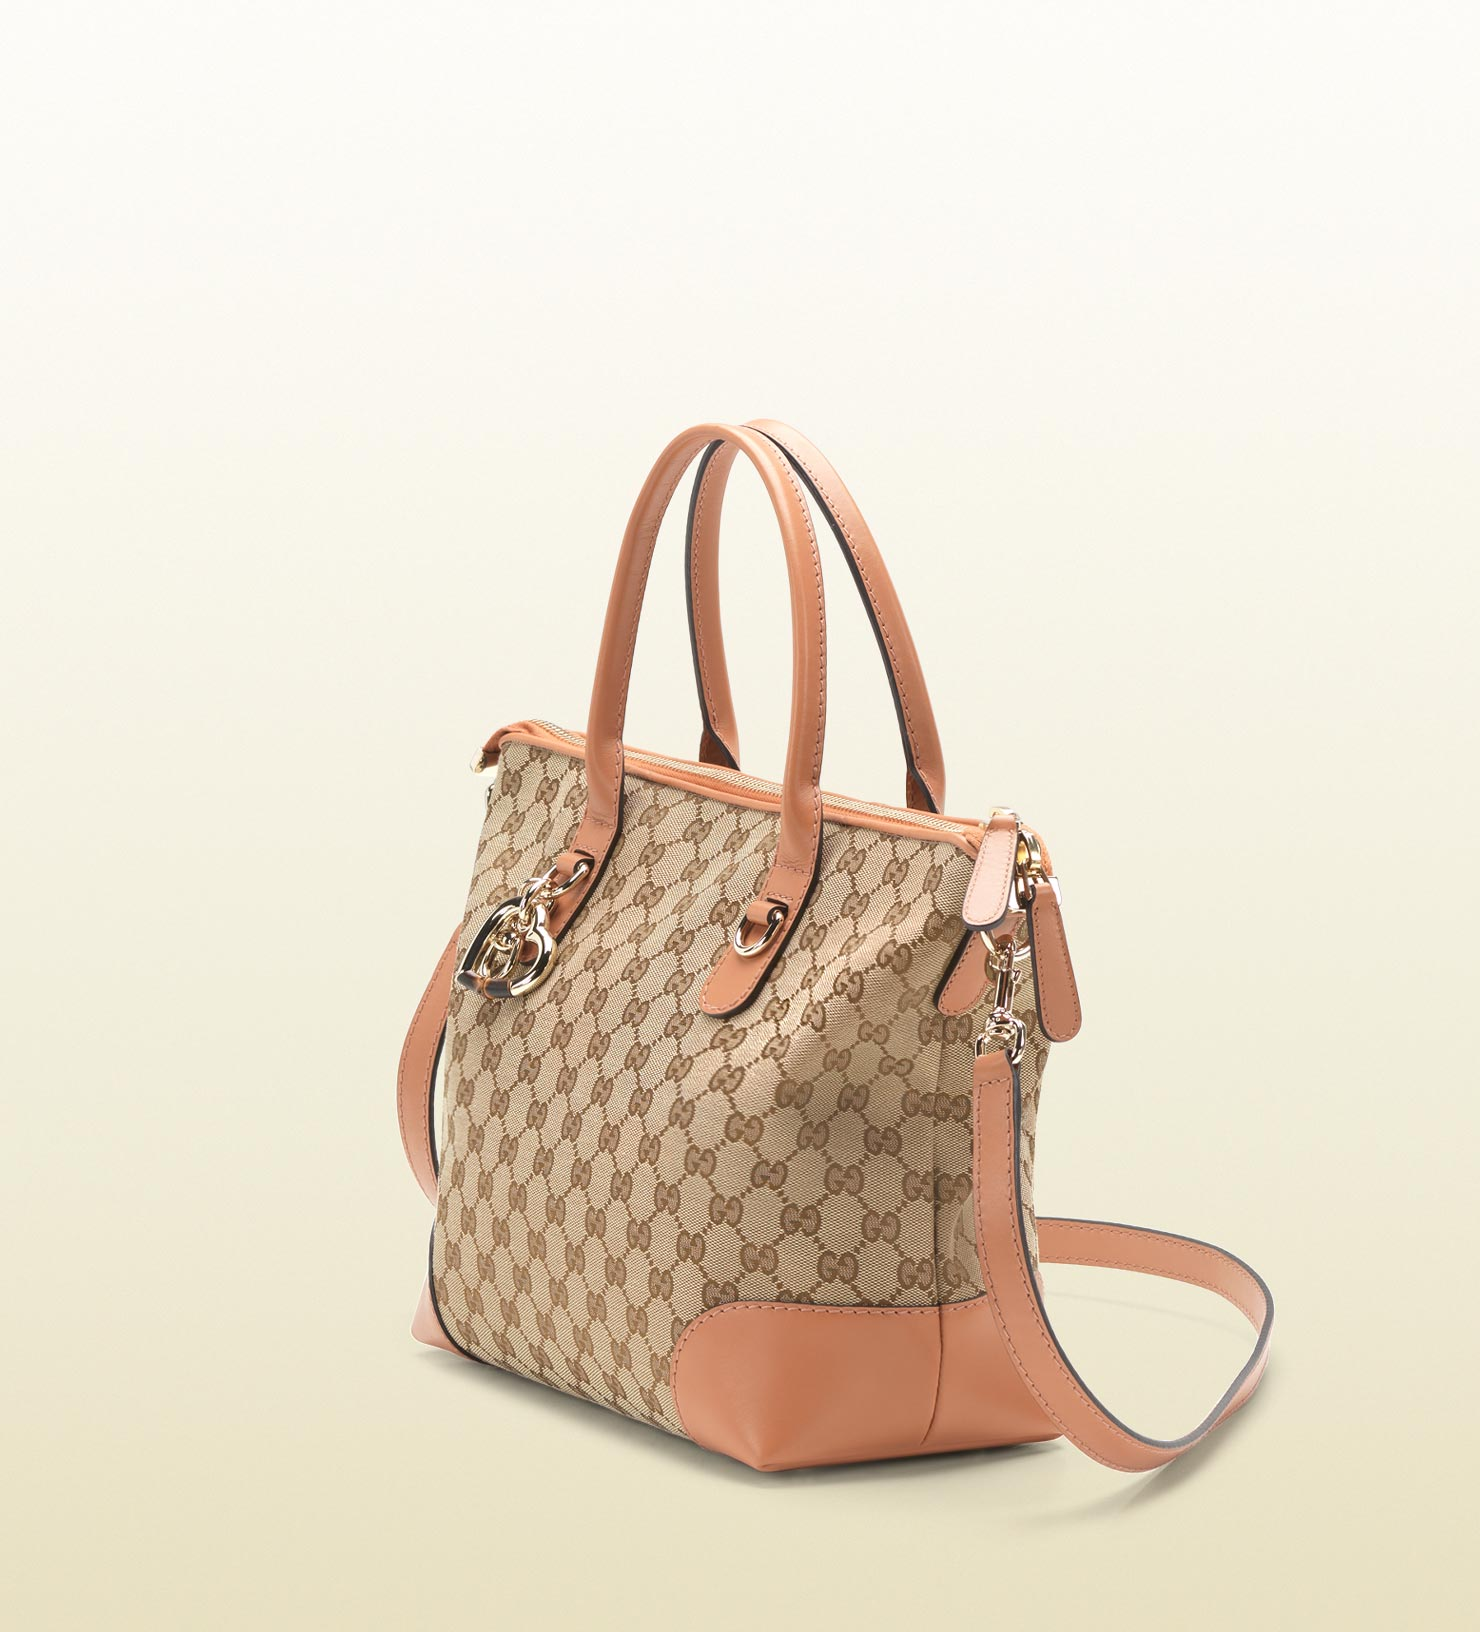 d5b467ac562 Gucci Heart Bit Charm Original Gg Canvas Top Handle Bag in Natural ...